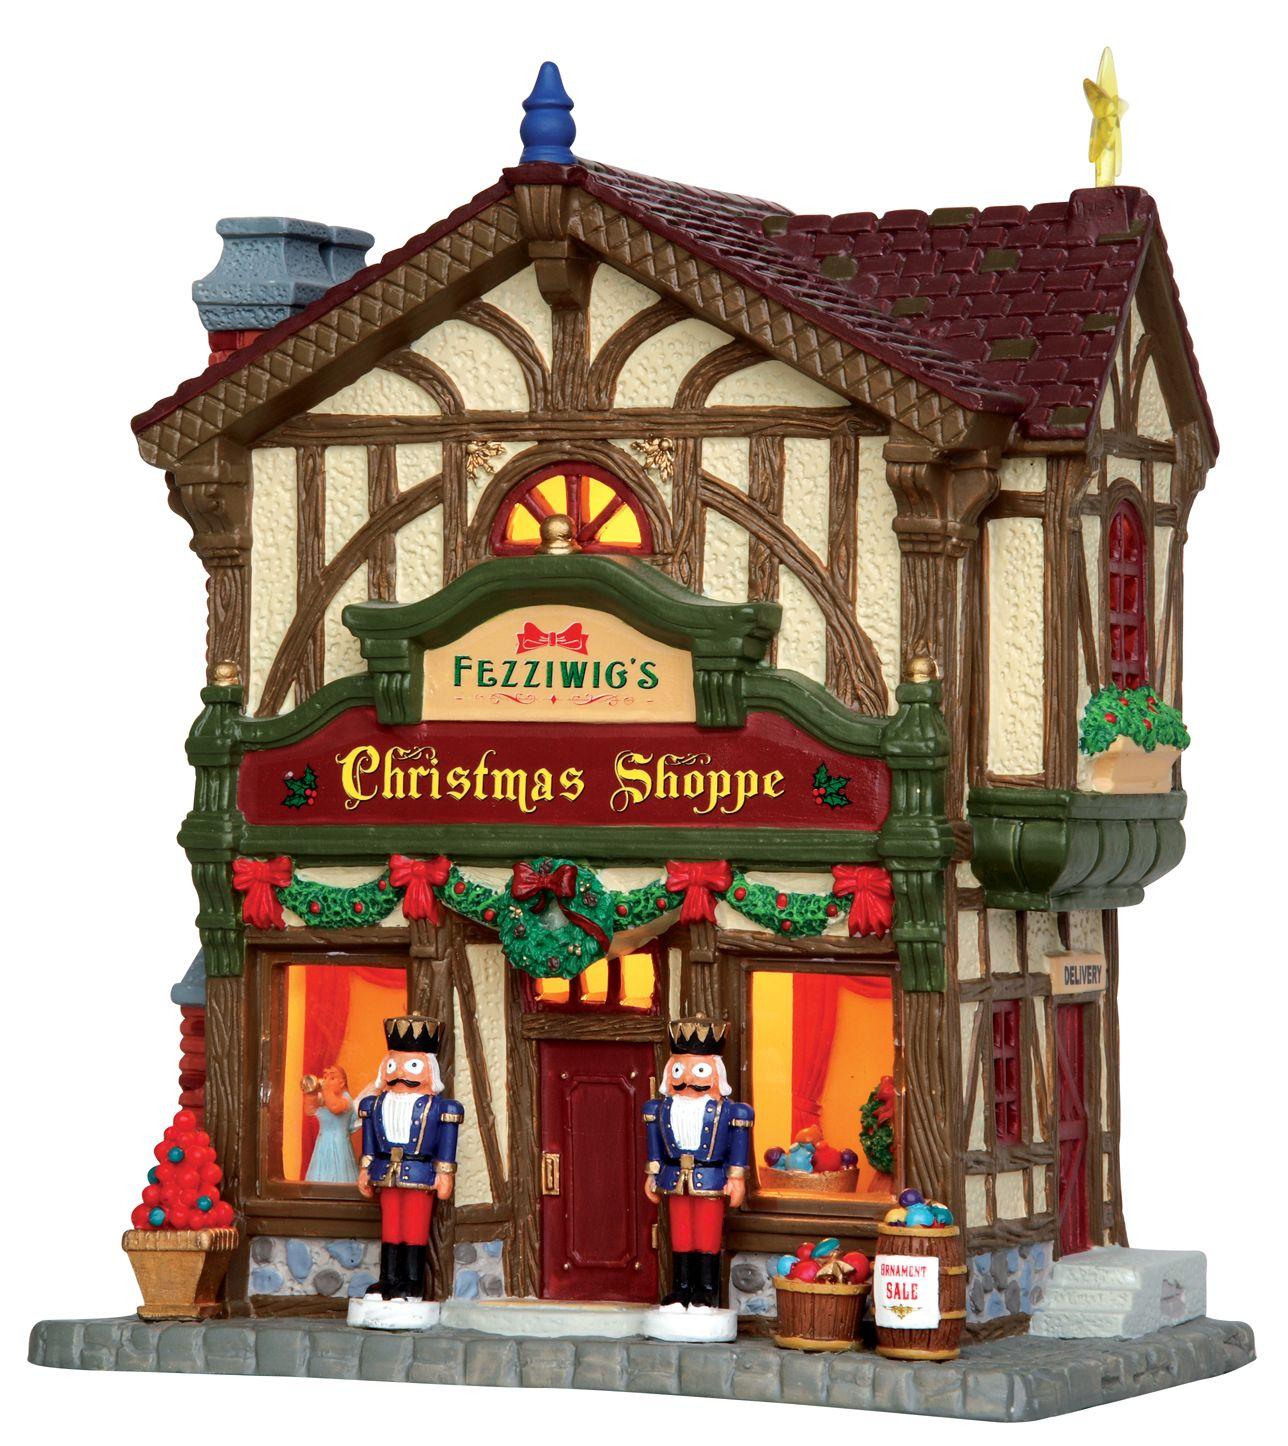 Lemax Fezziwig's Christmas Shoppe. SKU 45742 Released